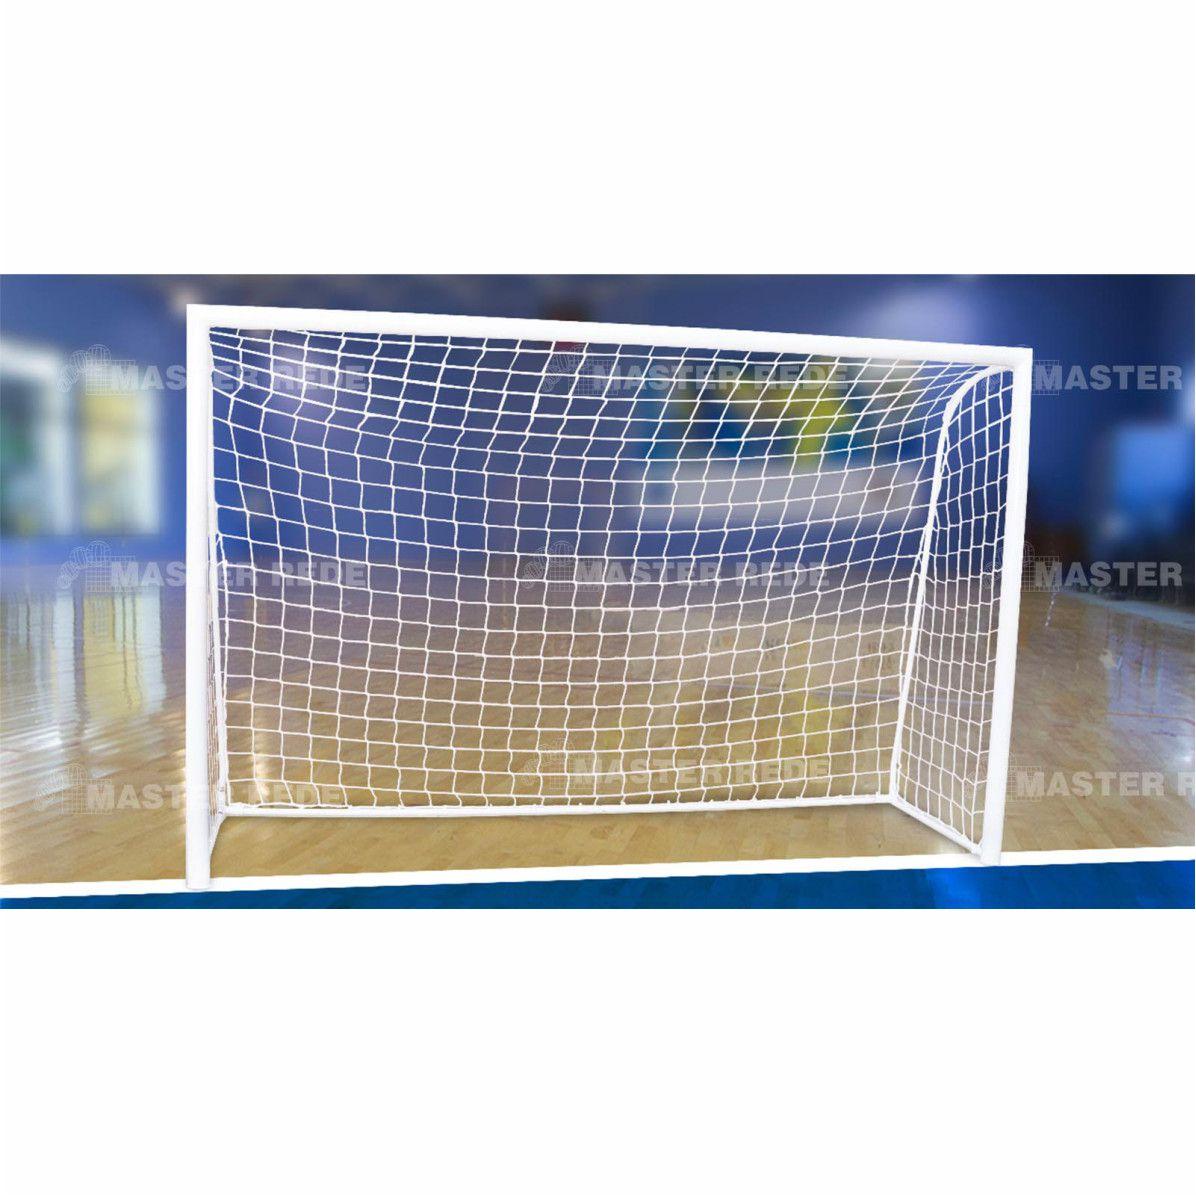 Rede Futebol Salao Futsal Master Rede Fio 4mm Seda FS-L4